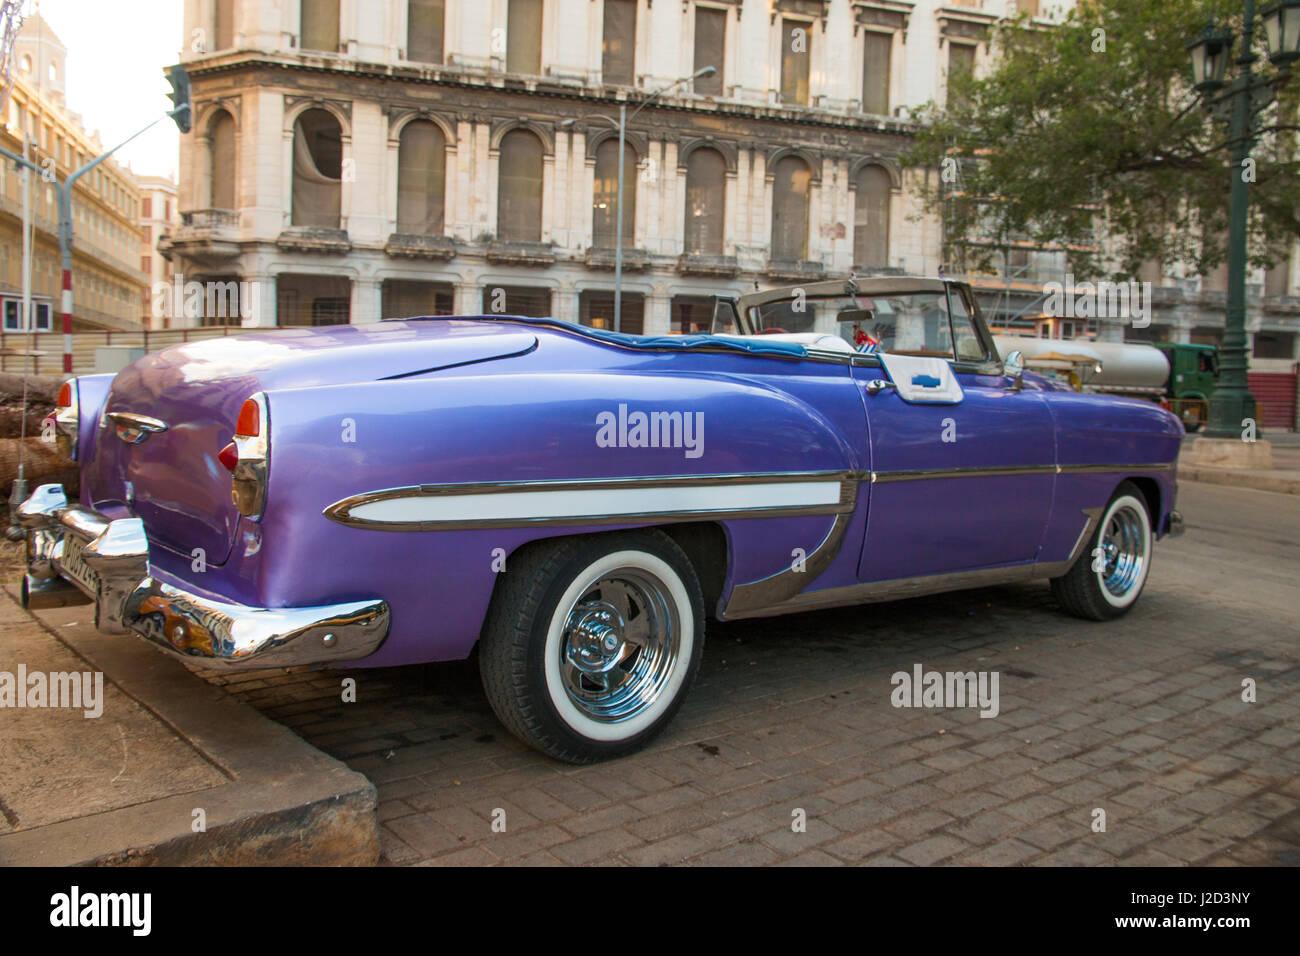 All Chevy 1954 chevrolet belair : 1954 Chevrolet Bel Air Stock Photos & 1954 Chevrolet Bel Air Stock ...